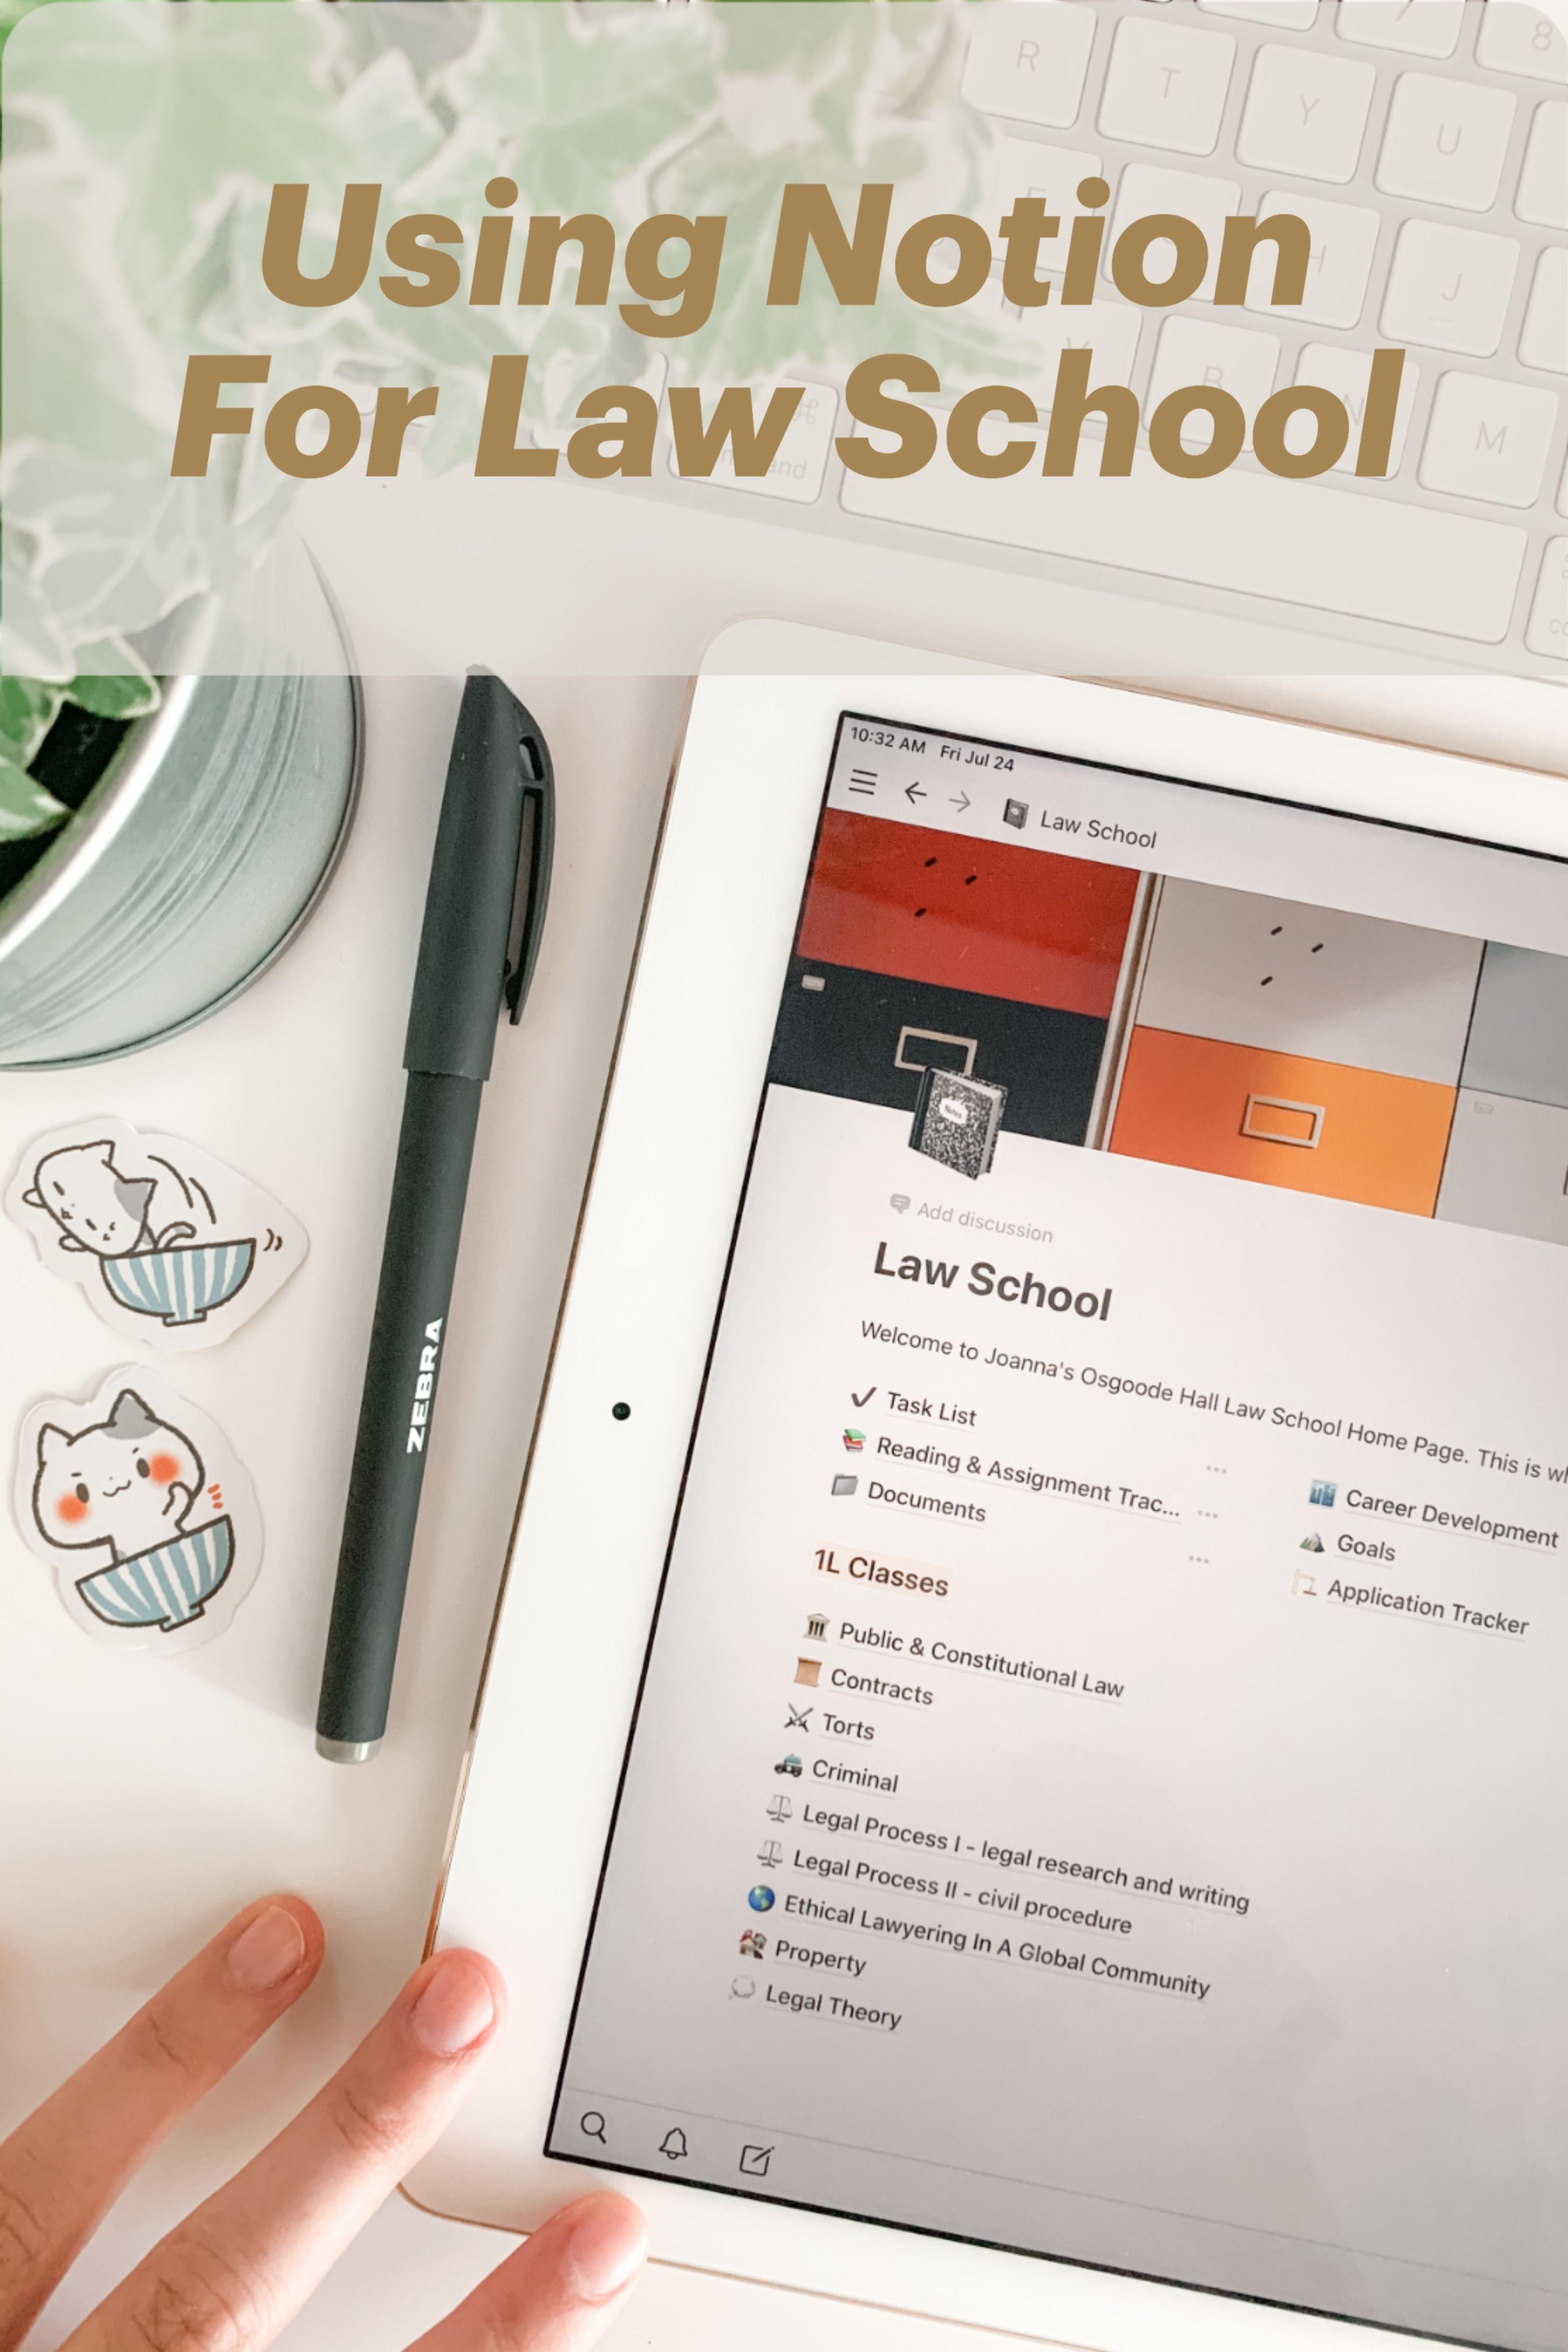 Using Notion For Law School In 2021 Law School School Organization Notions